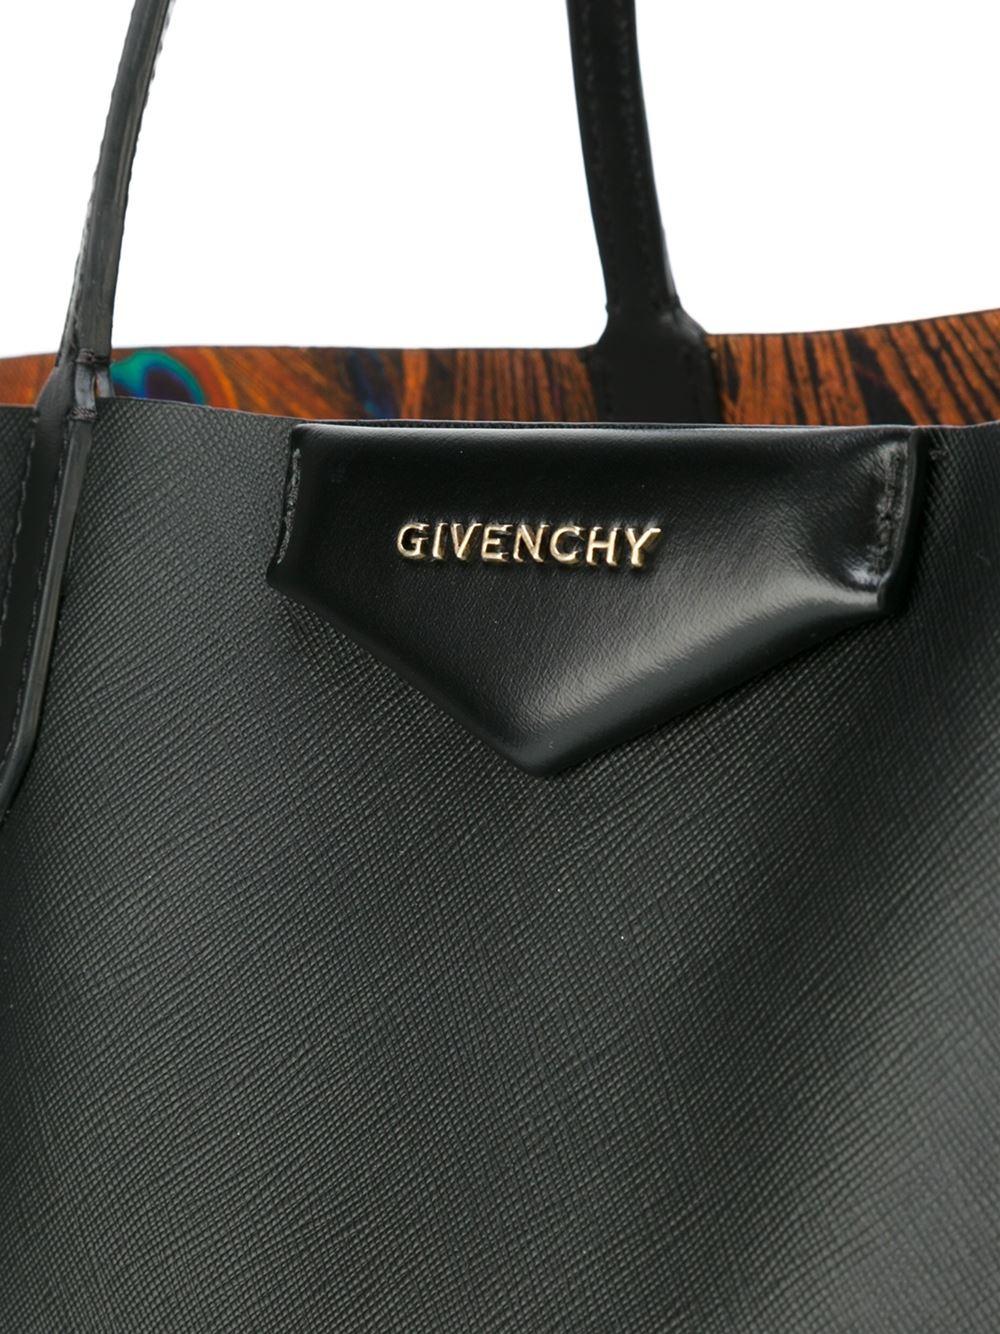 631c3015eaa1 Lyst - Givenchy Peacock Print Antigona Shopping Bag in Black